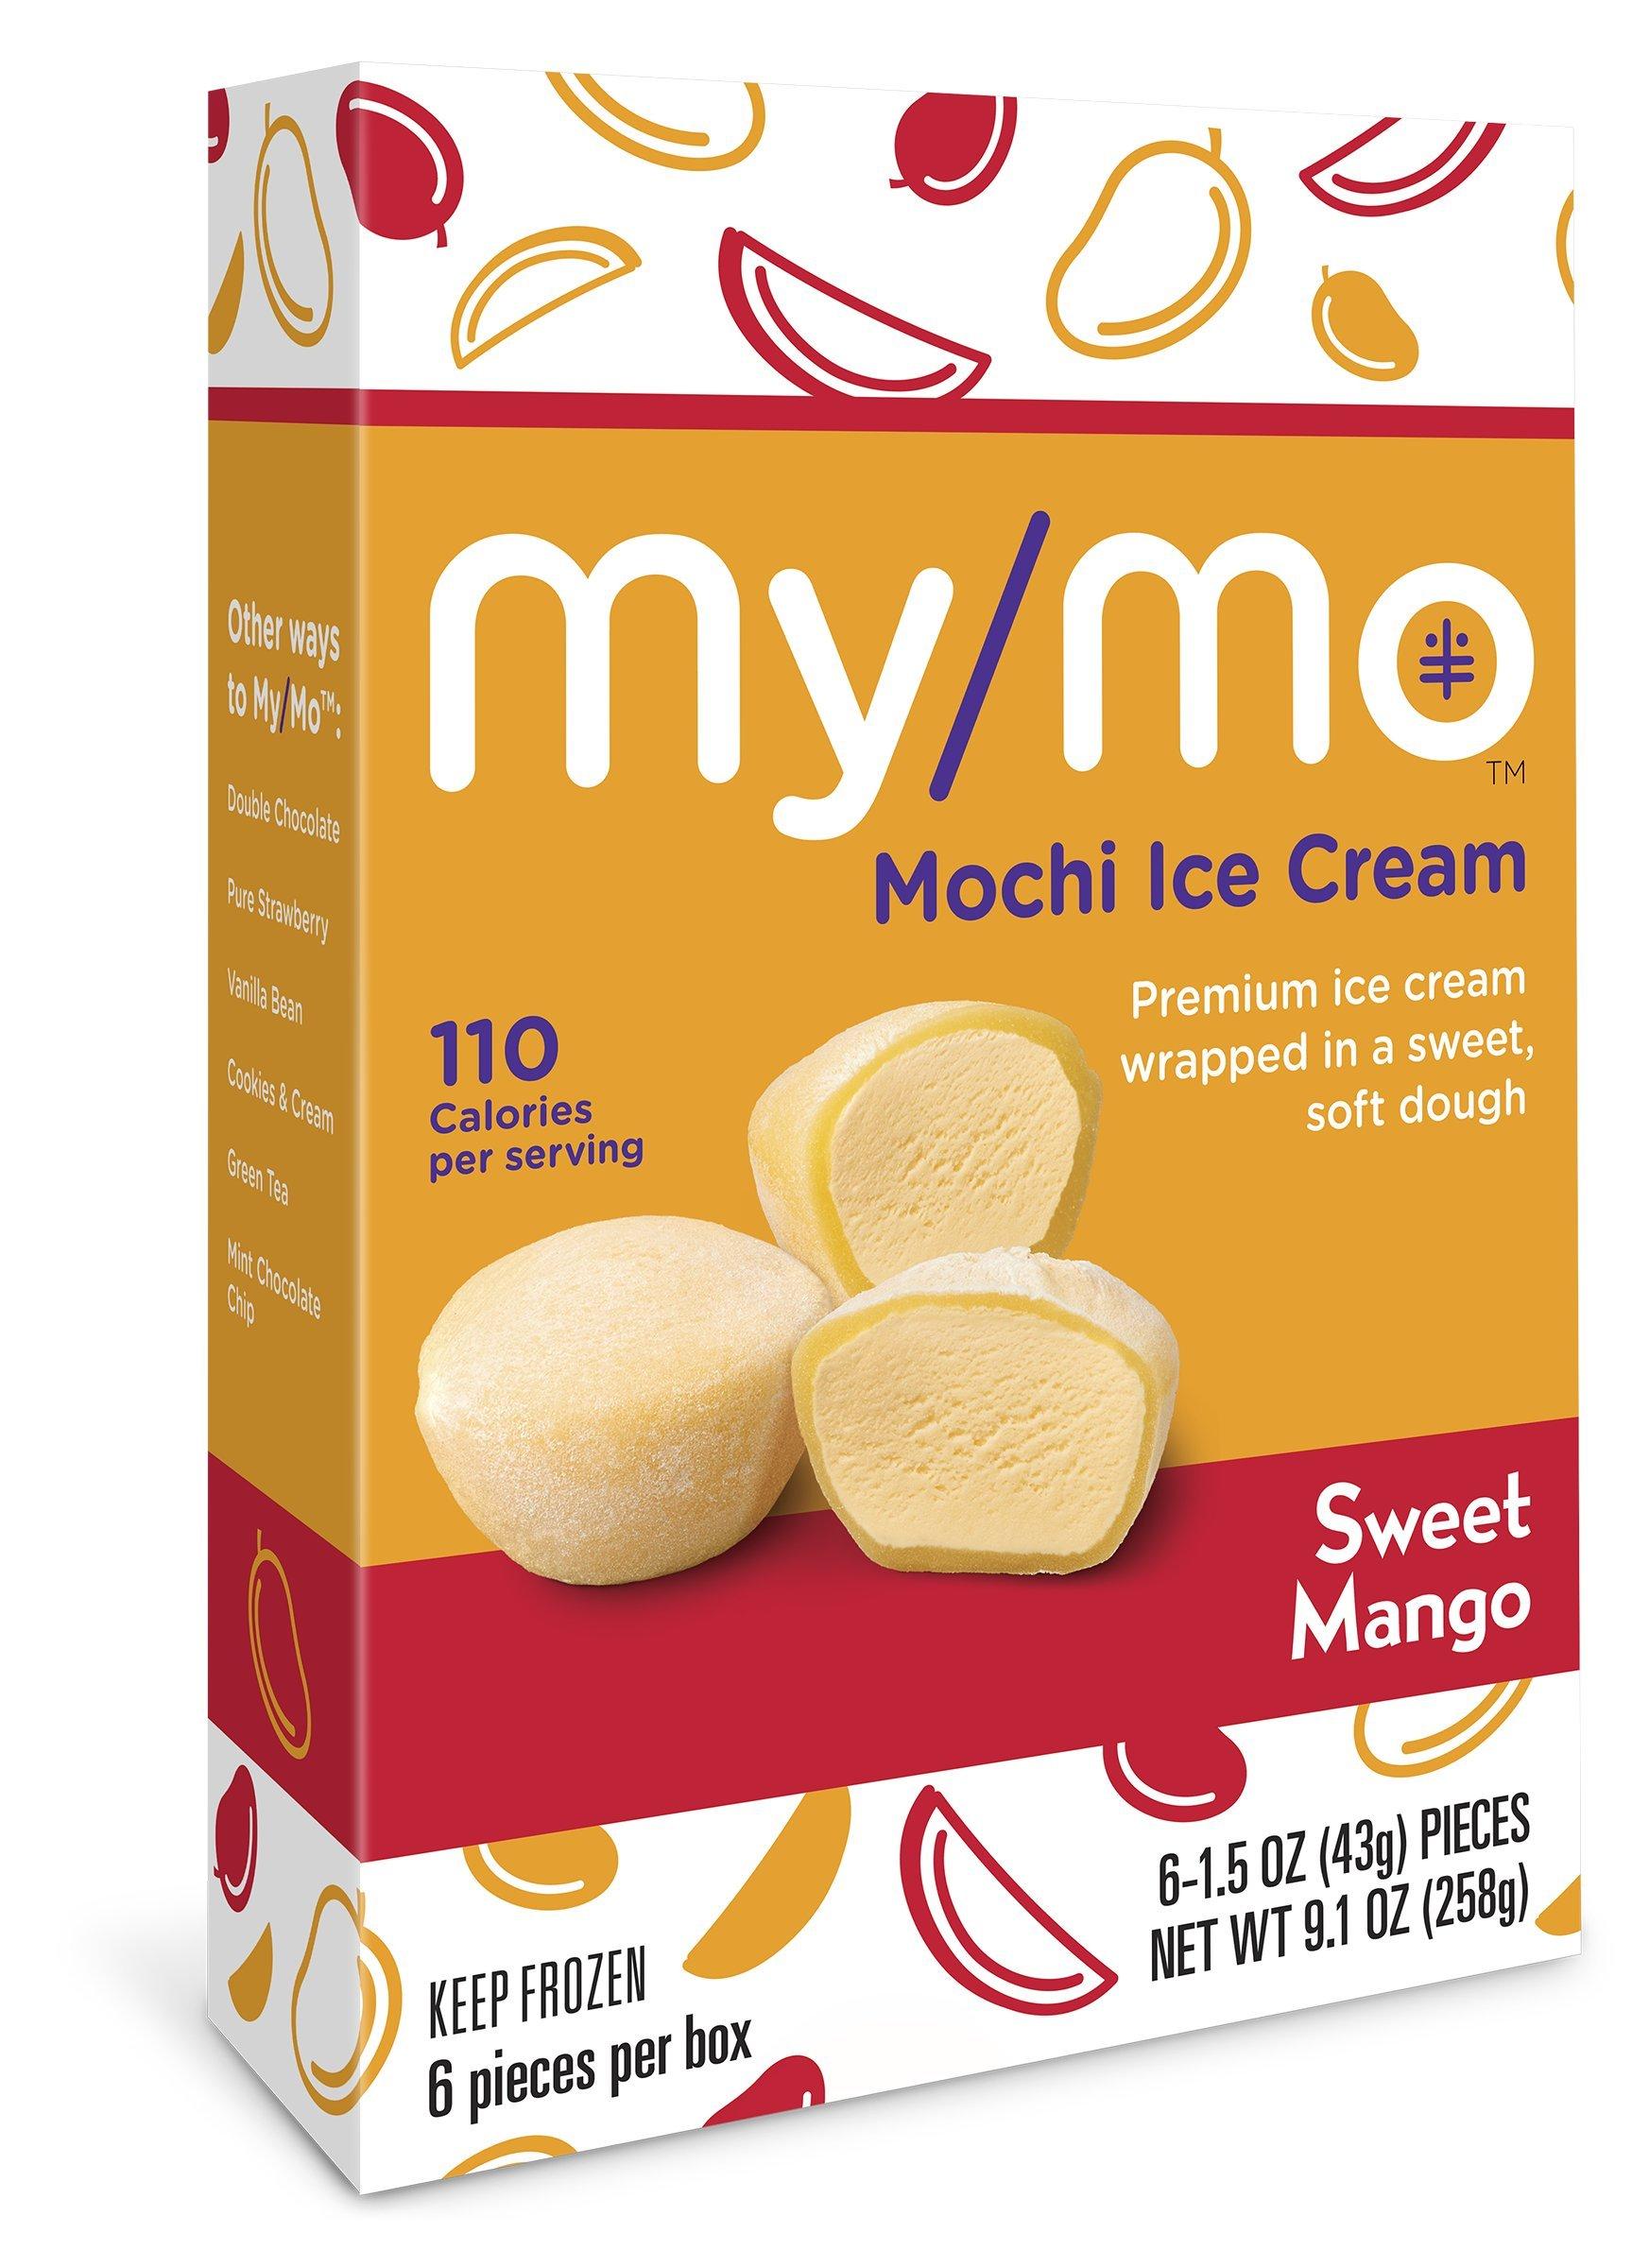 My/Mo Sweet Mango Mochi Ice Cream - 36 Mochi Ice Cream Balls (6 x 6ct. Boxes)